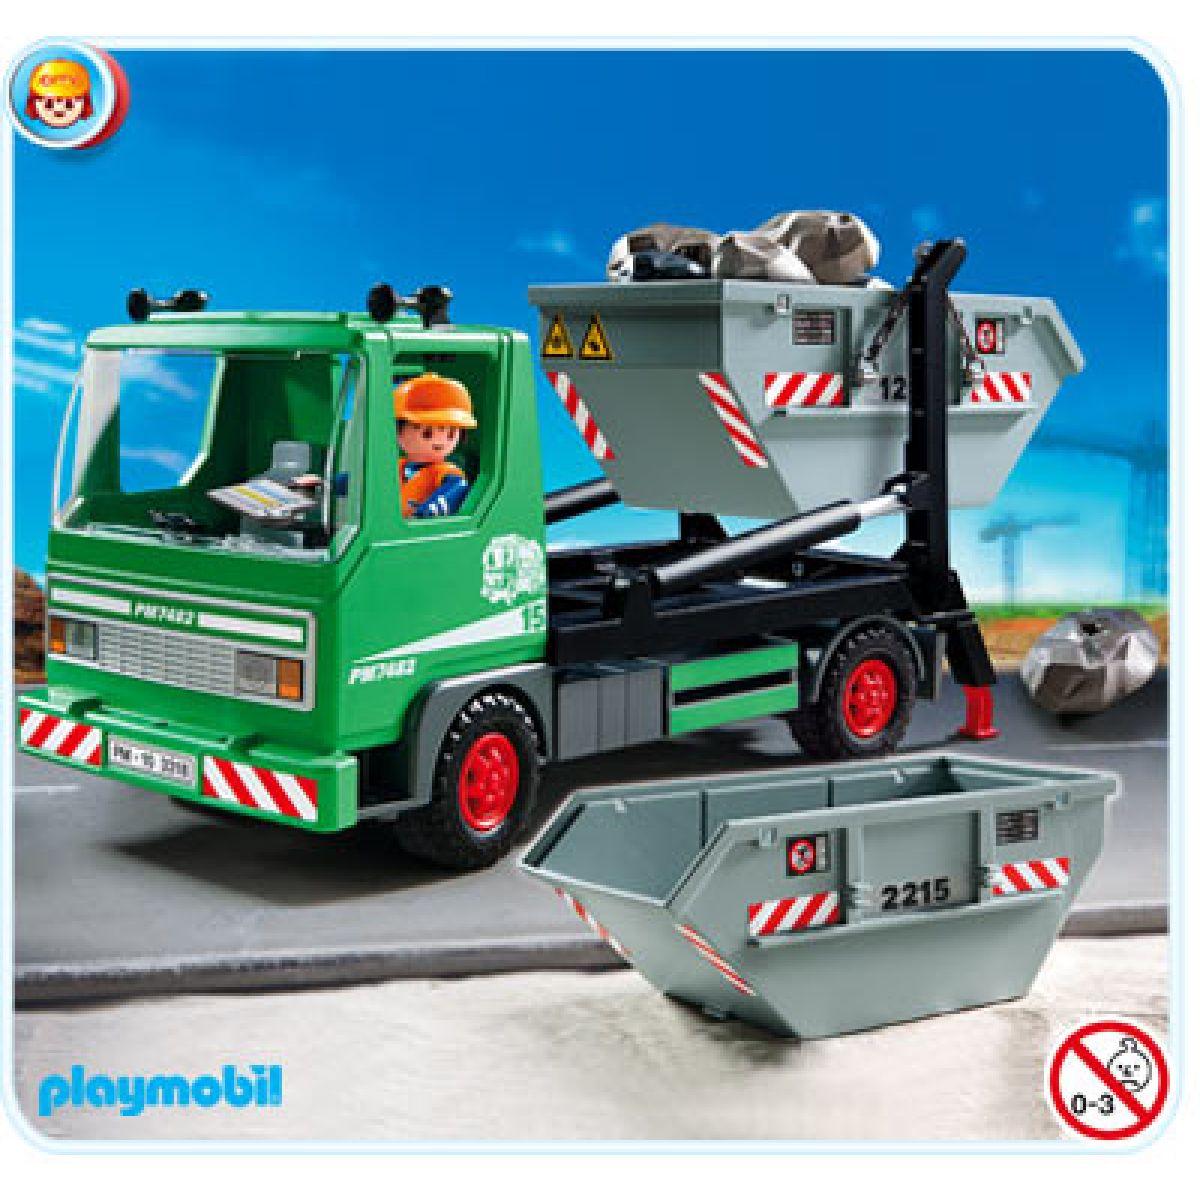 Auto s kontejnery Playmobil 3318